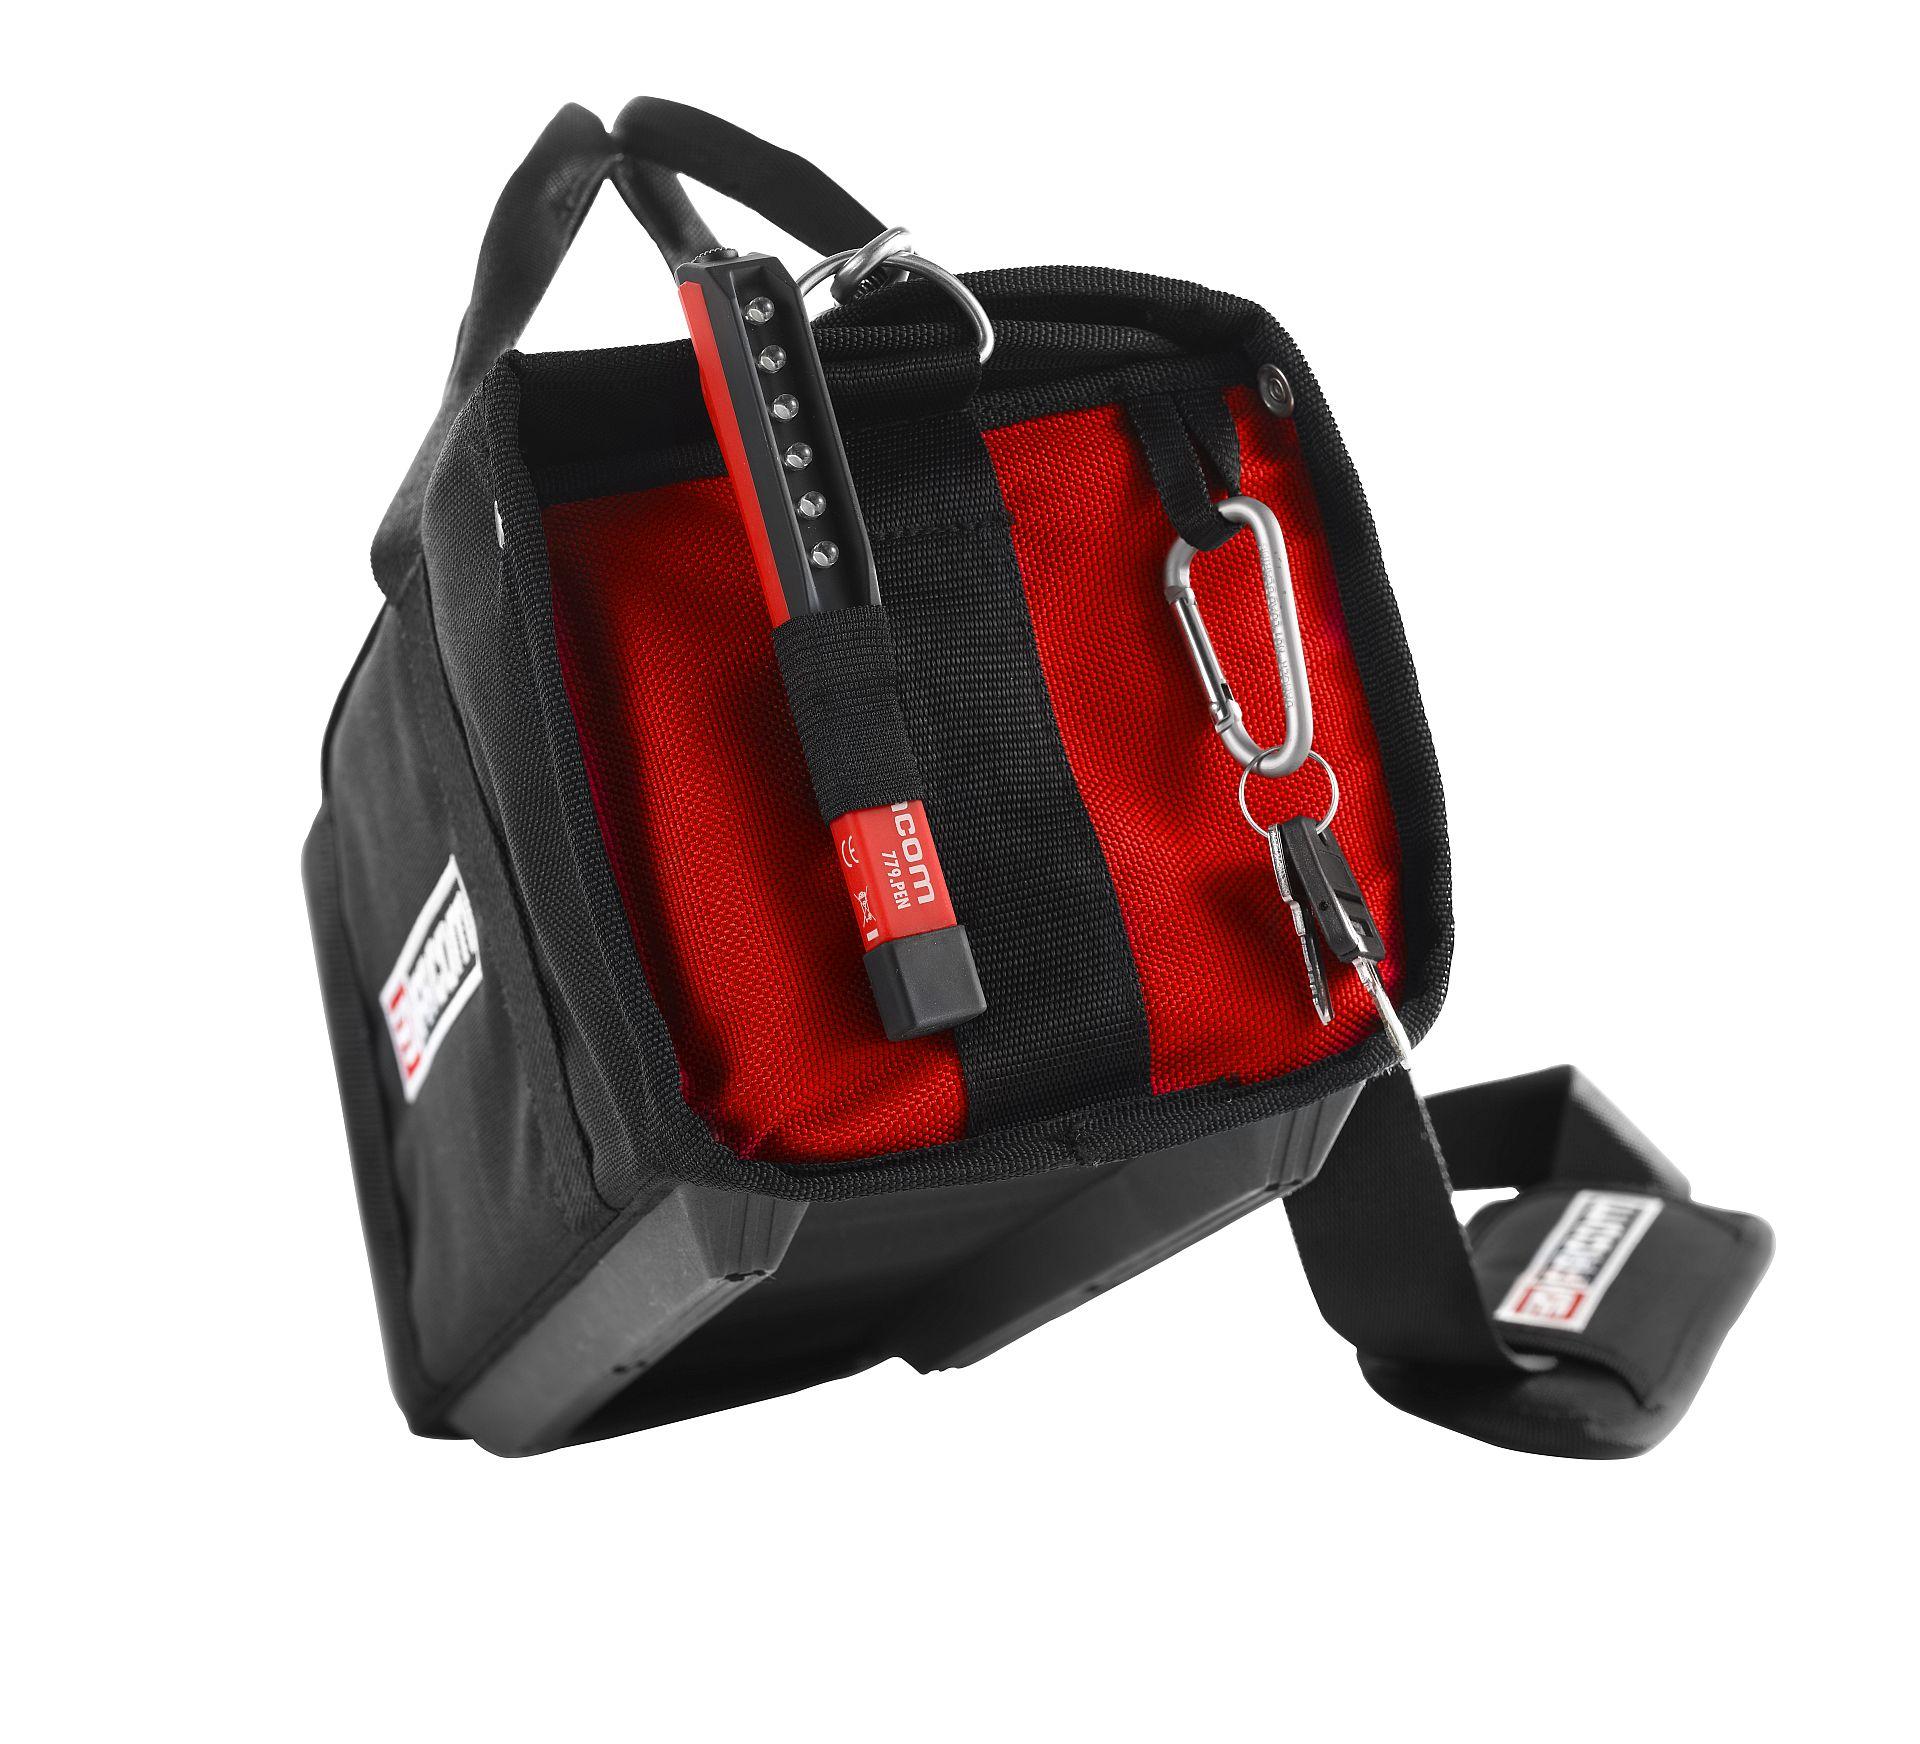 facom bs smb probag mini werkzeugtasche montagetasche f werkzeug ebay. Black Bedroom Furniture Sets. Home Design Ideas